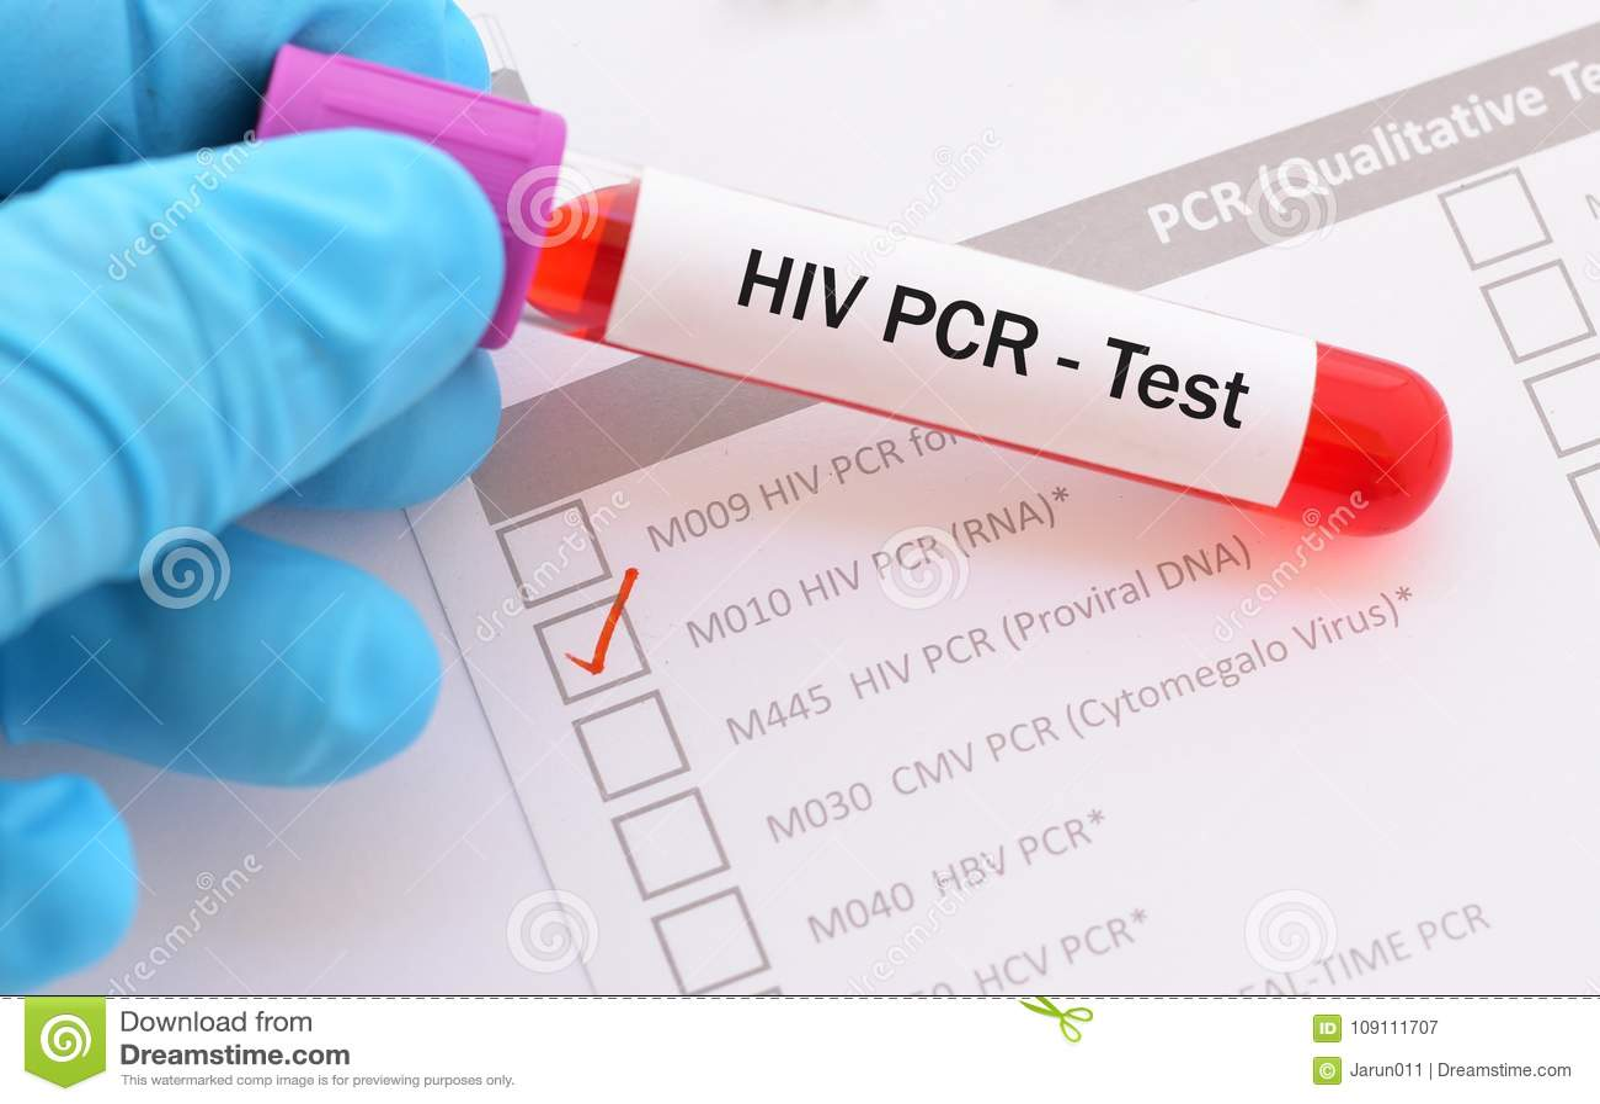 Blood Sample For Hiv Pcr Test Stock Image